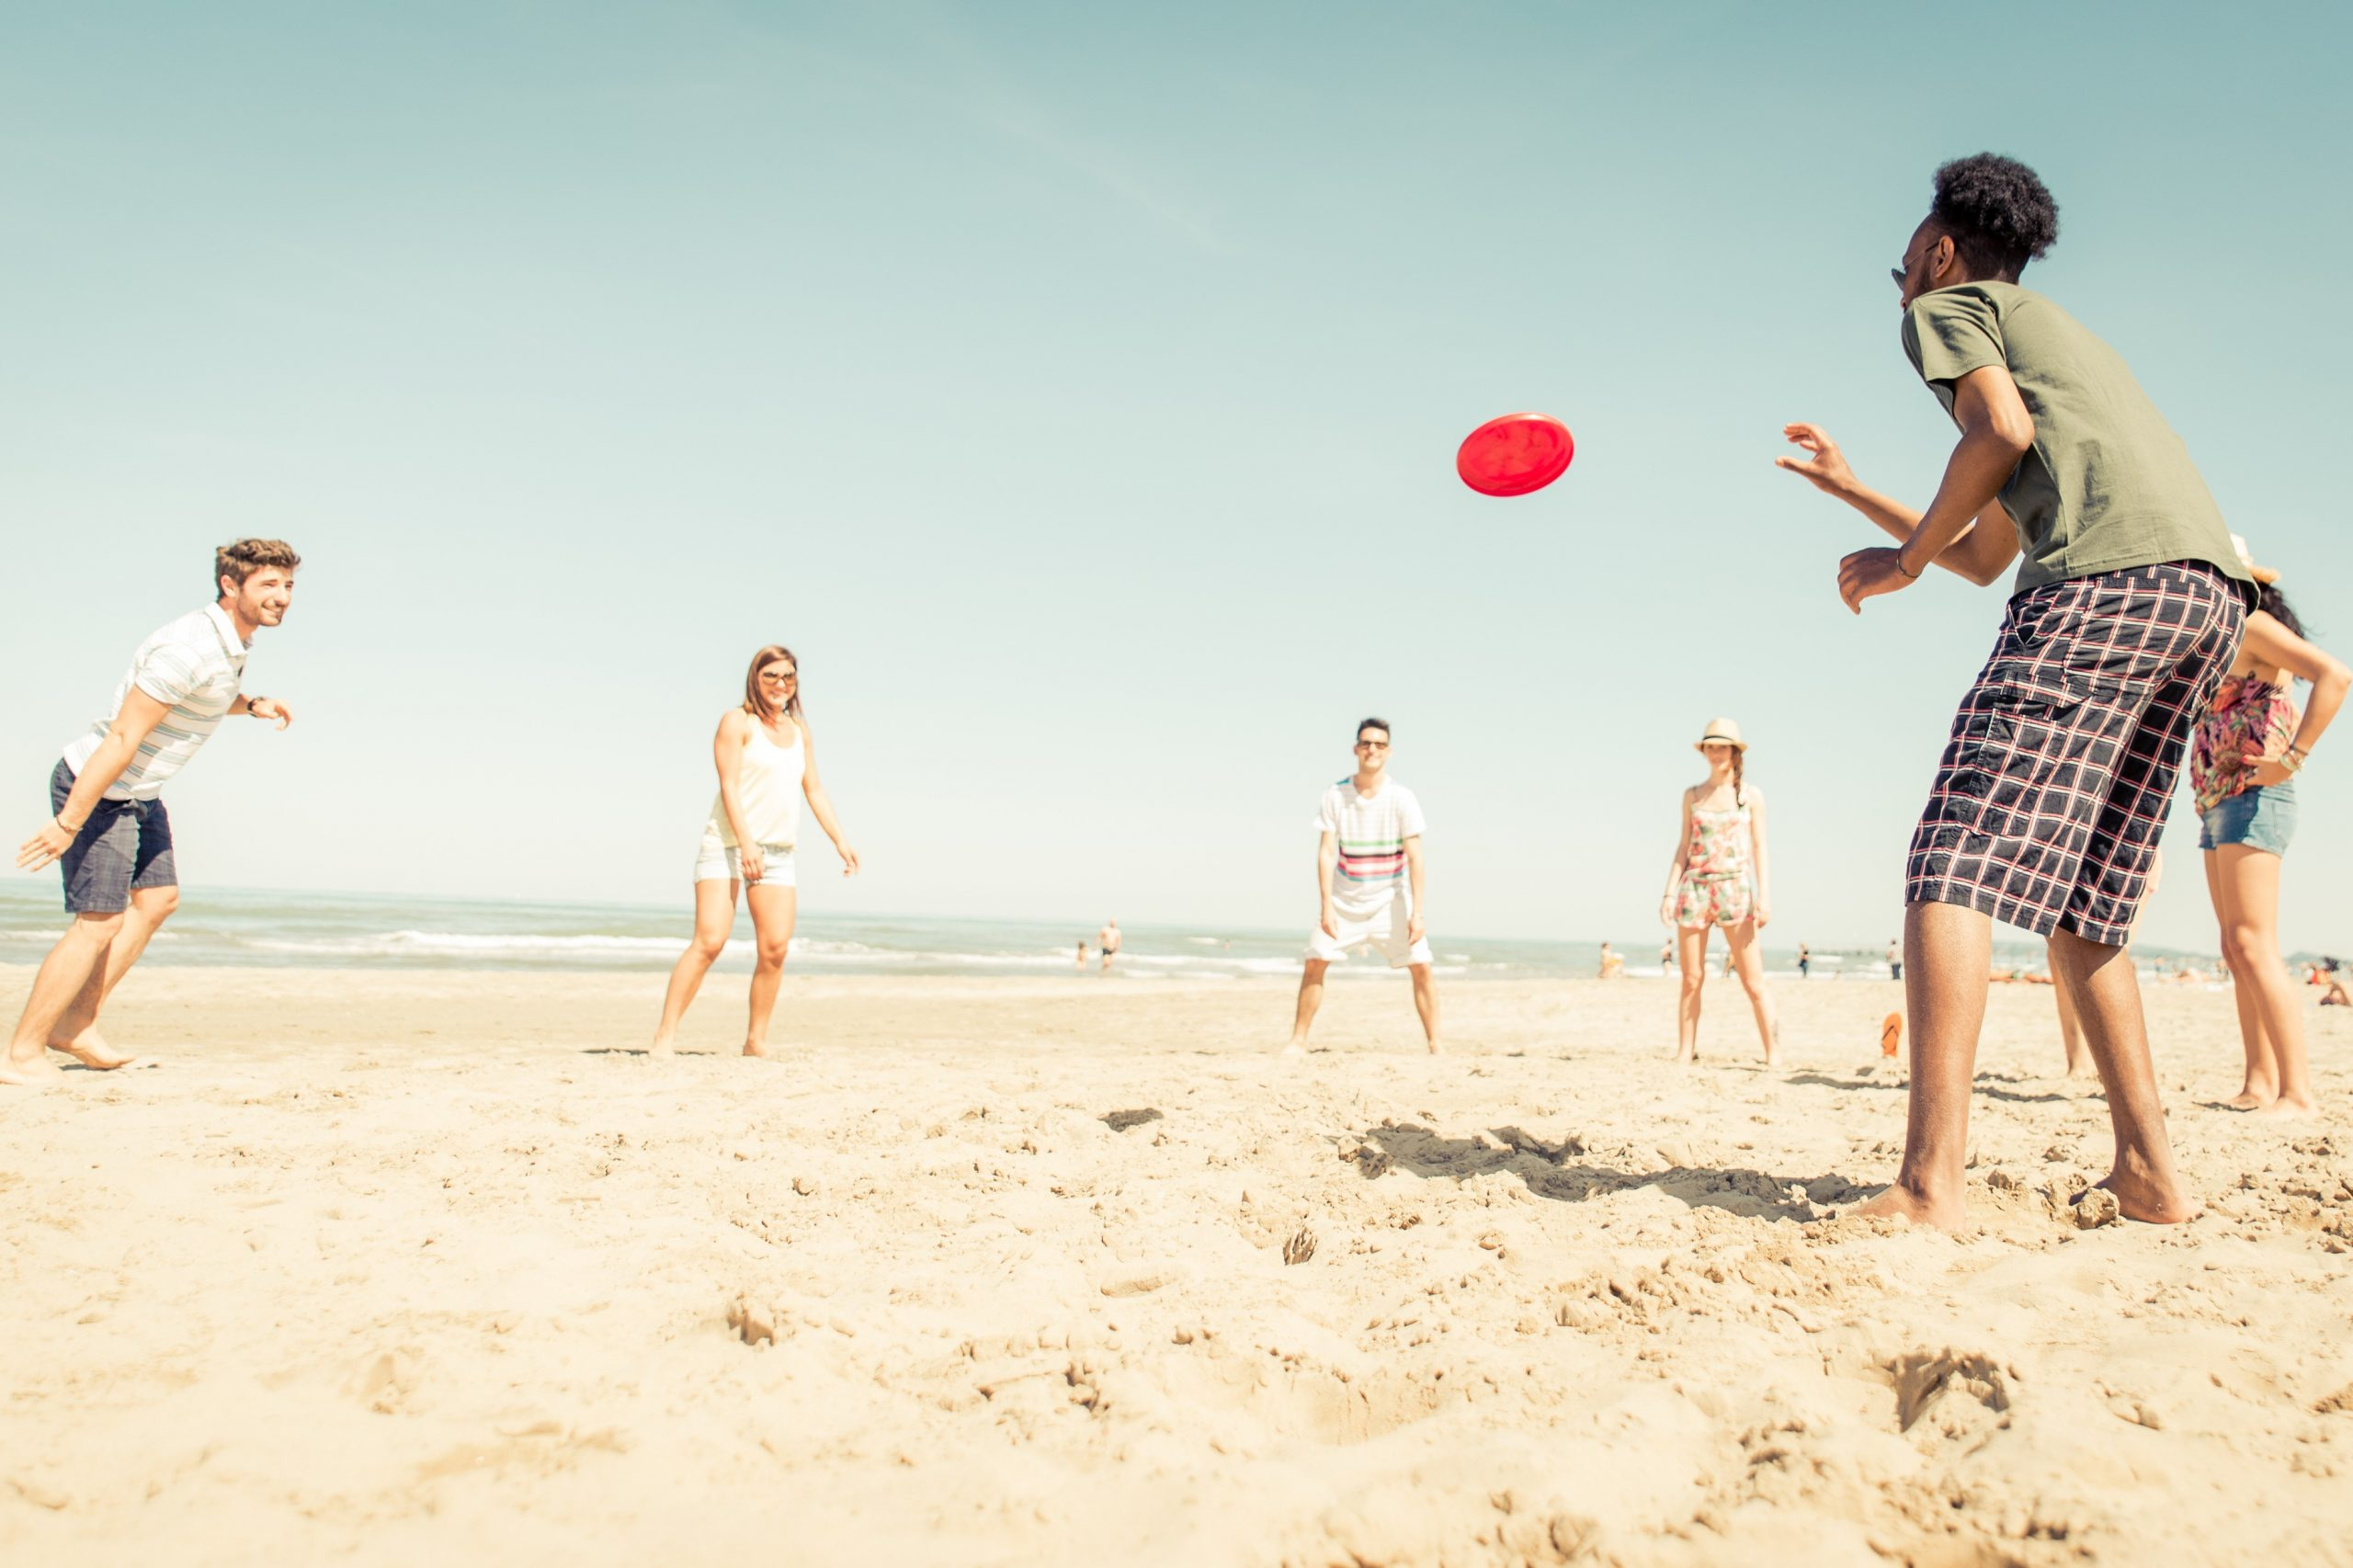 Šport Frisbee